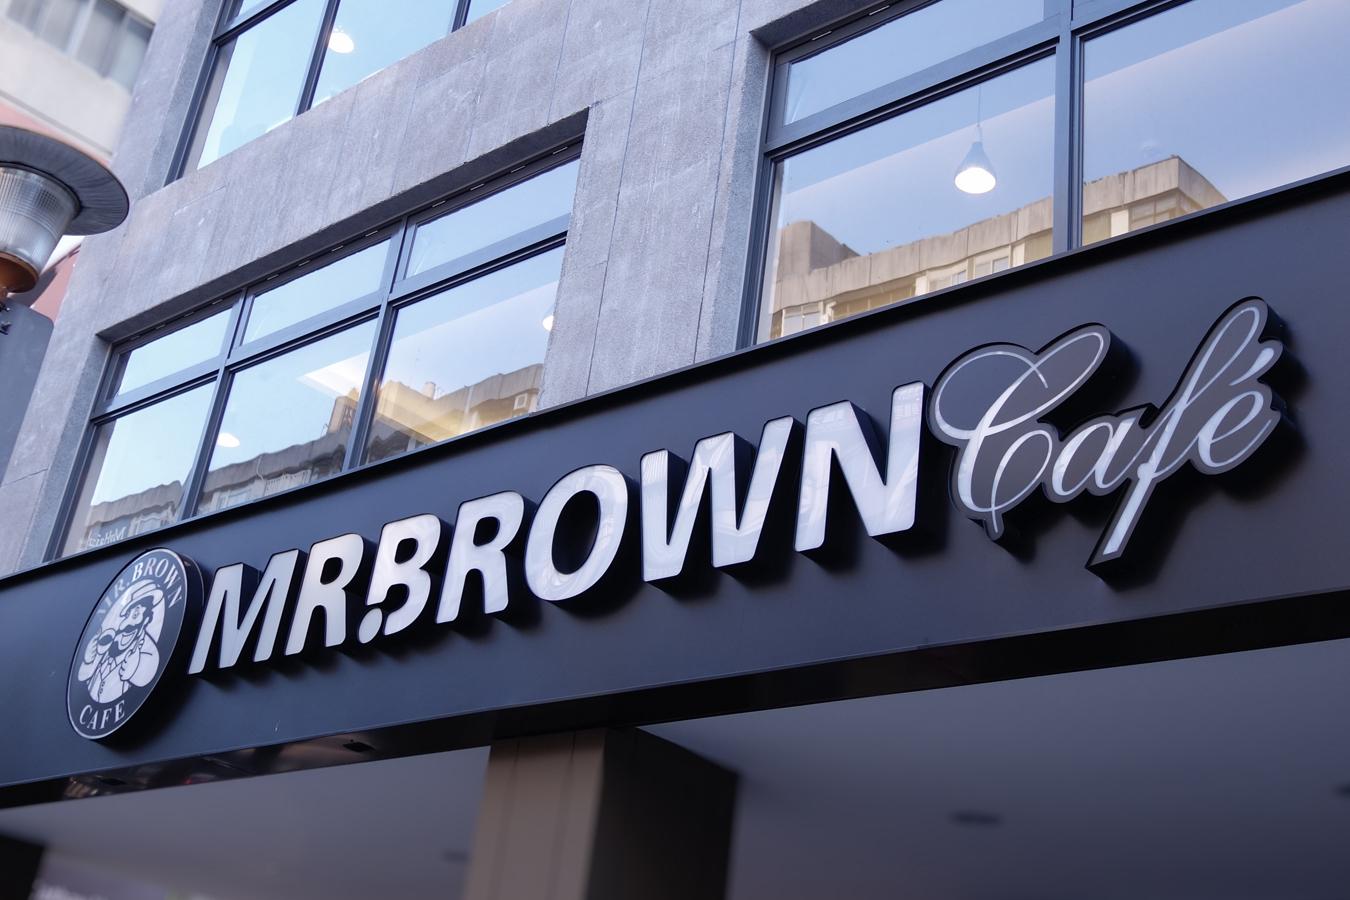 MR.BROWN cafe 品牌策略/形象整體BI規劃設計